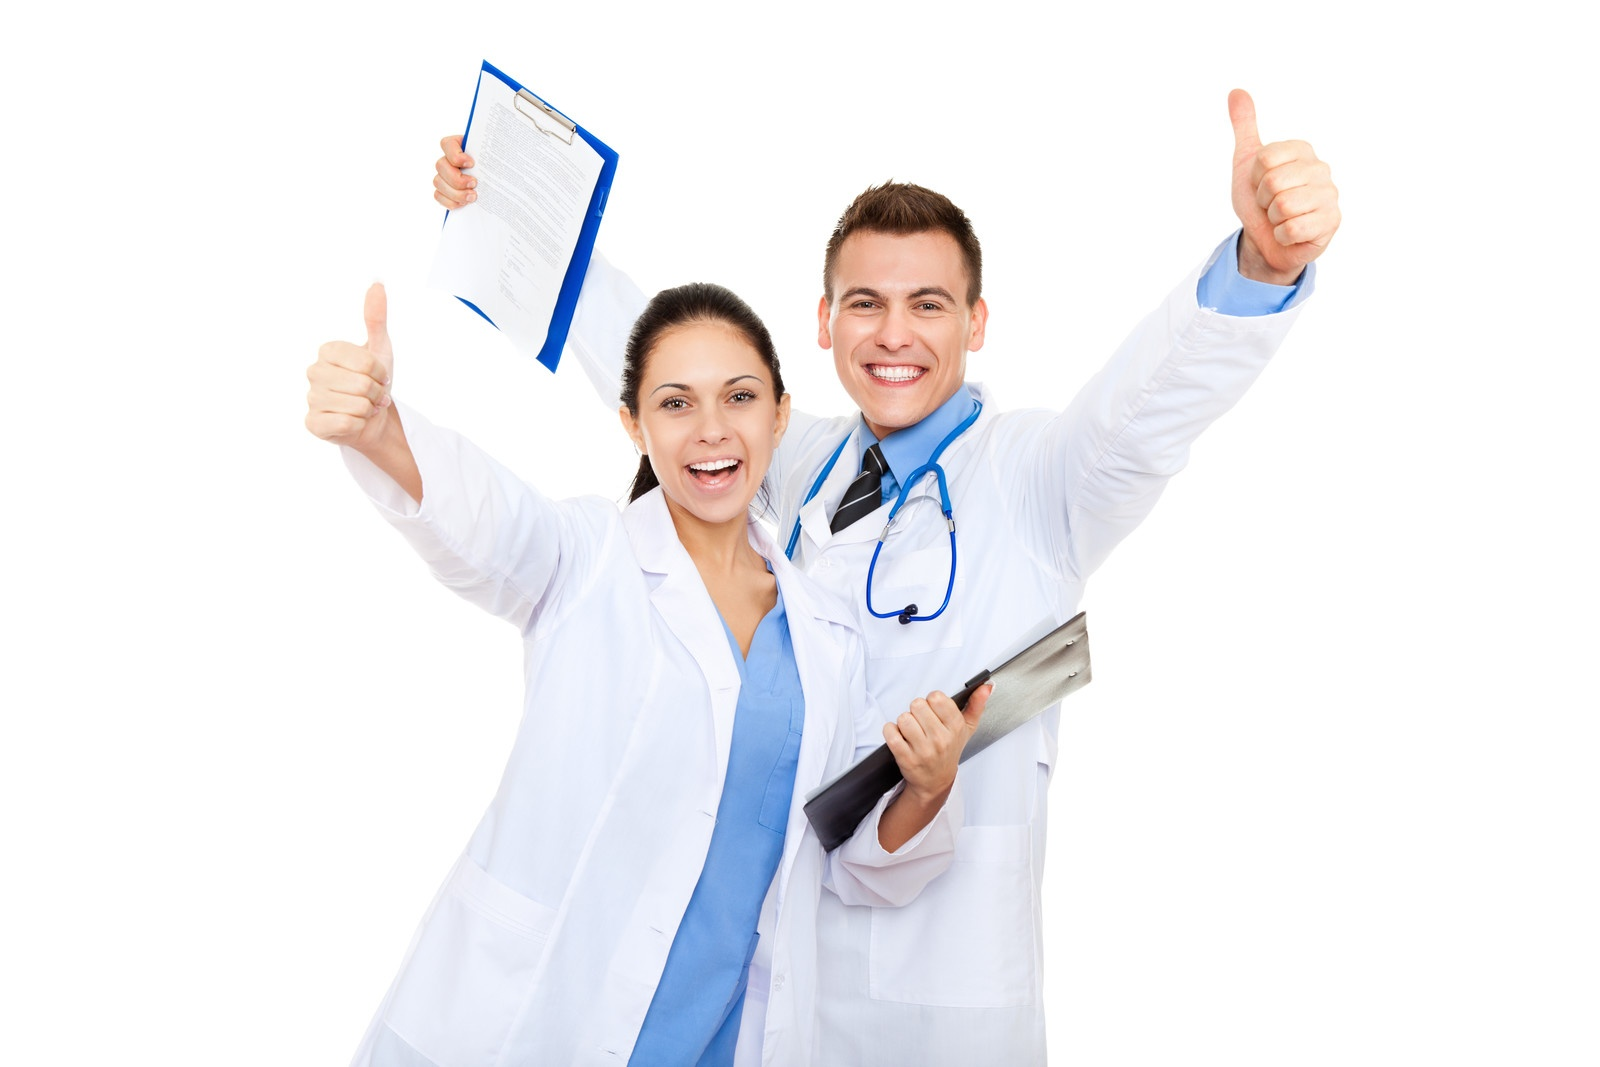 Excited_Doctors_Urodynamics_Testing_Comany.jpg